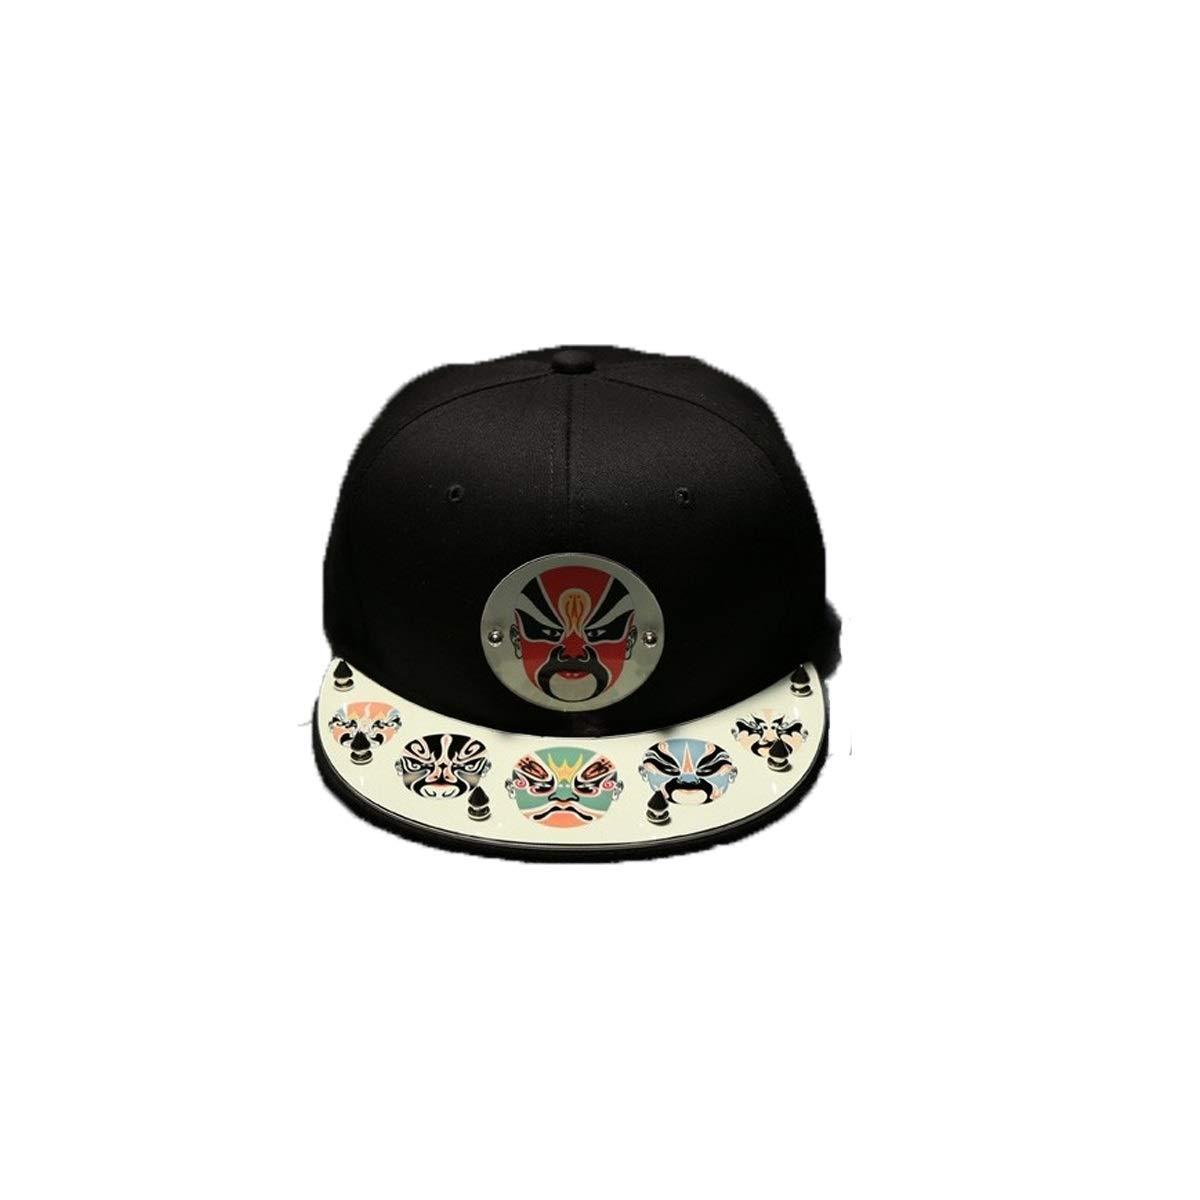 Zhongyue Chinese Style Hat Male Personality Classic Face Baseball Cap Fashion Luminous Hat Female Trend Retro, Black Summer hat (Color : Black)